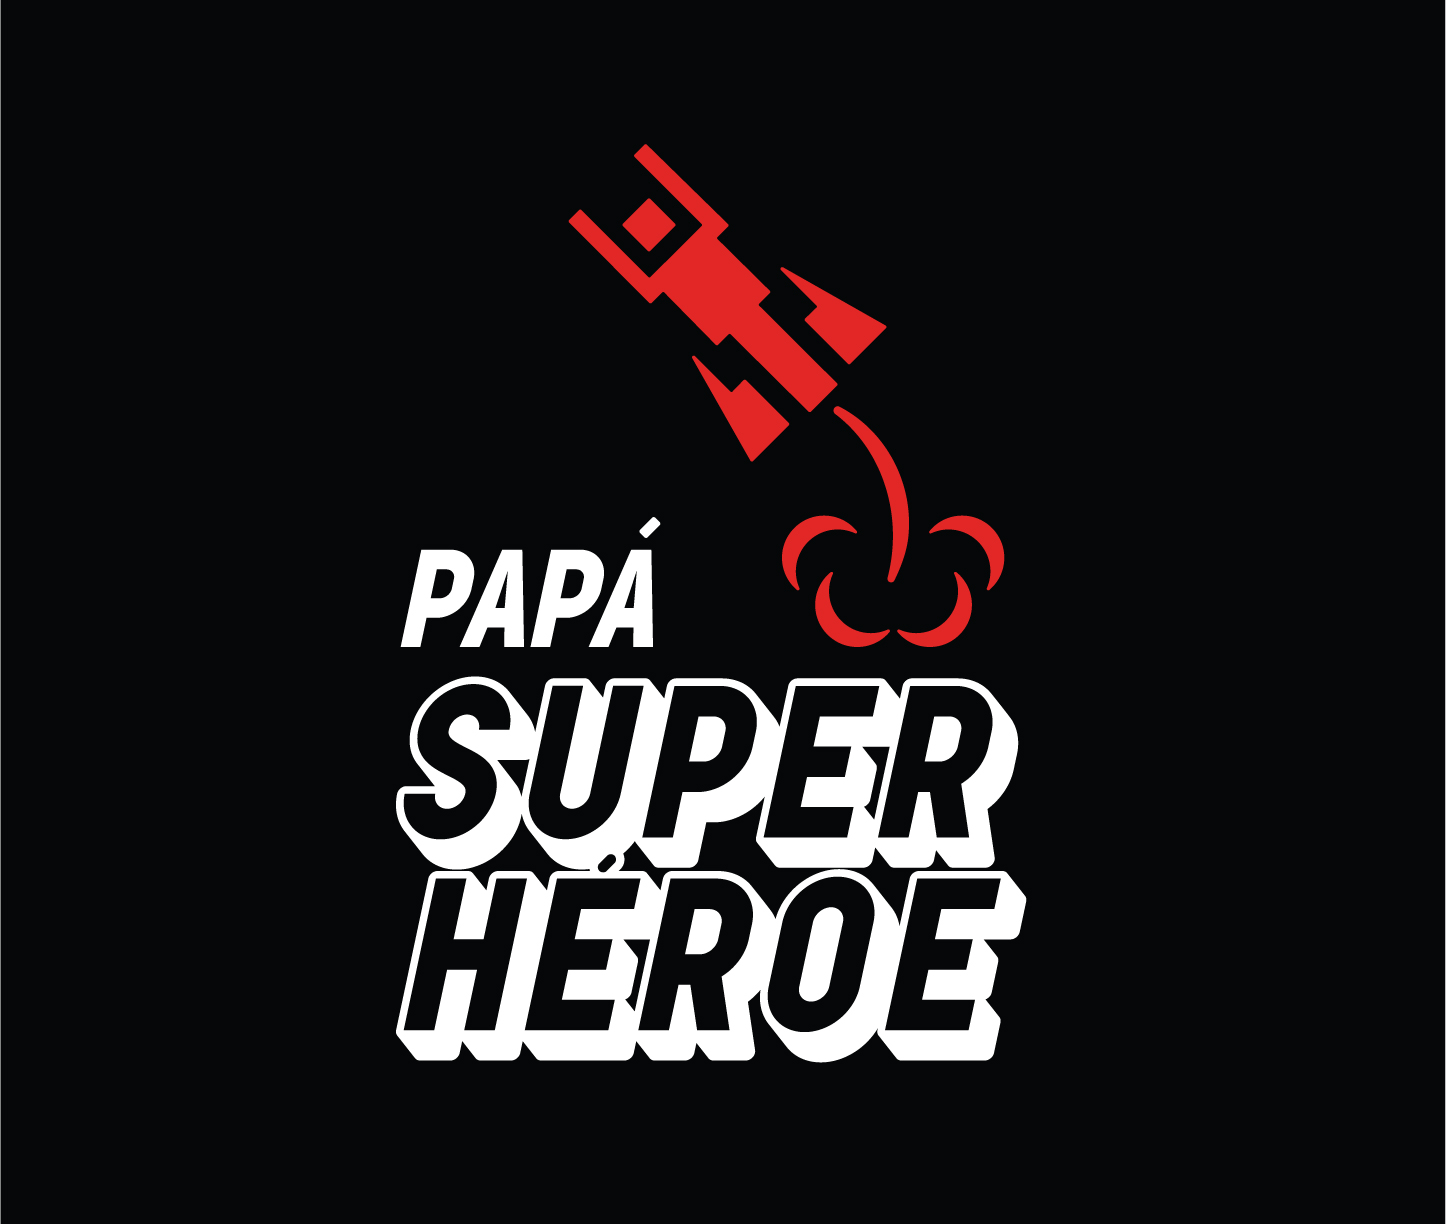 PAPA SUPER HEROE